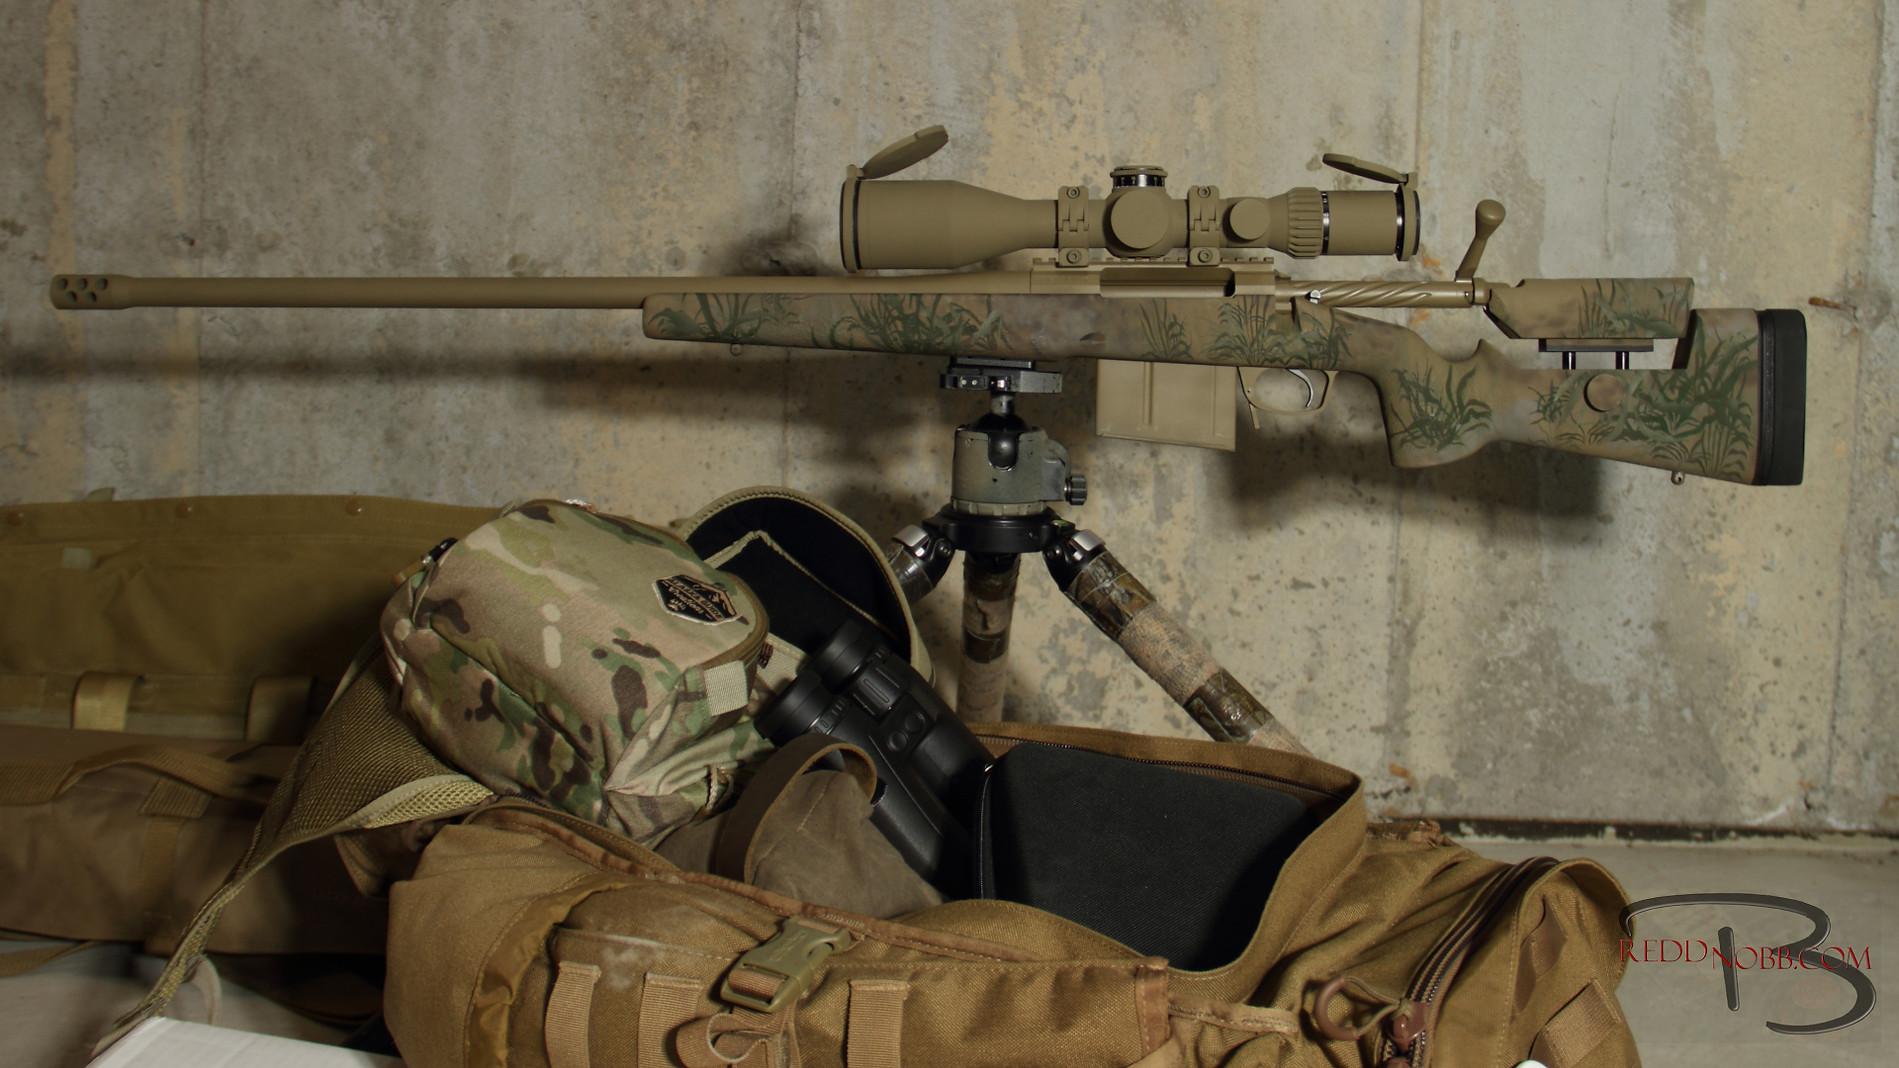 Une 338 Lapua Mag long range hunter 2de64c_6c2f58d4776e408f8c90201e1334dcc3~mv2